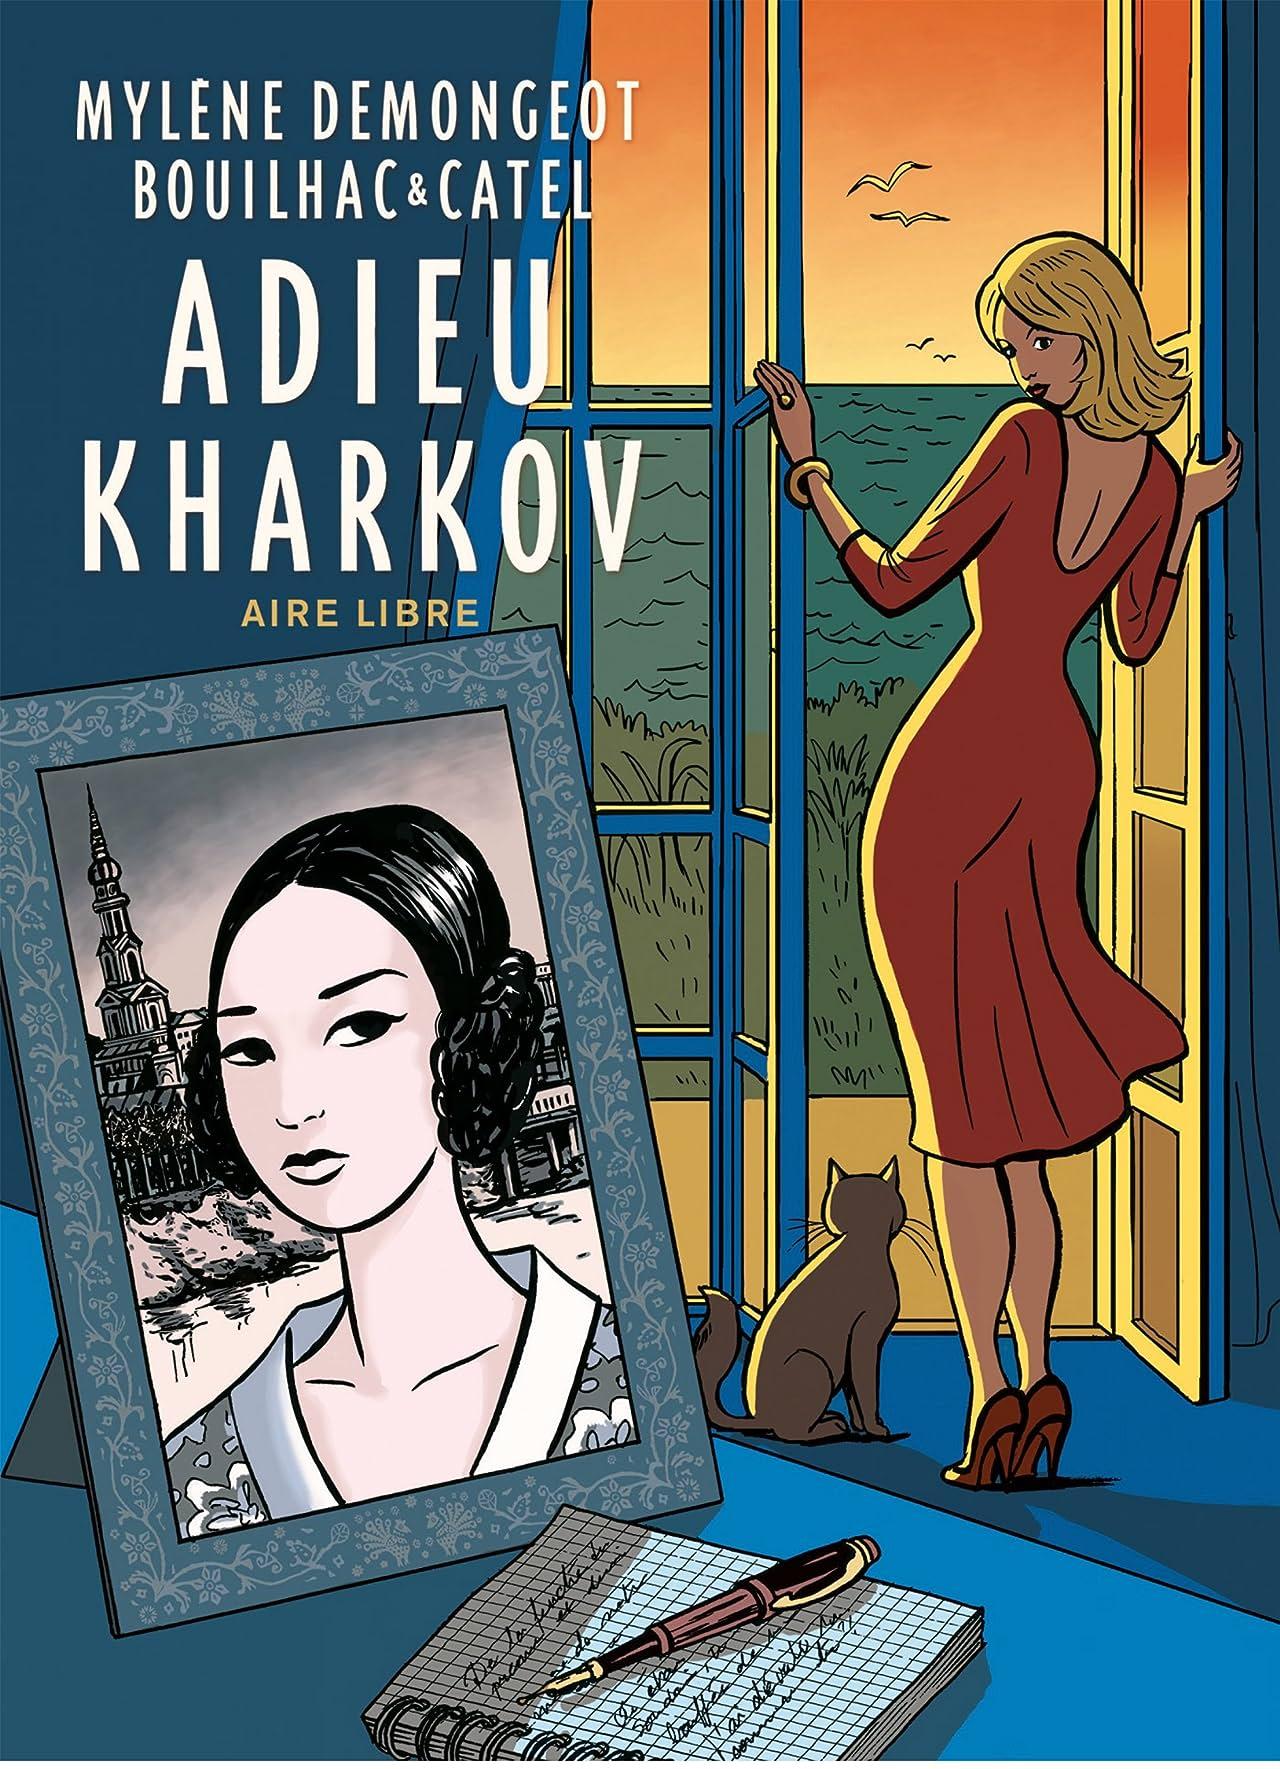 Adieu Kharkov